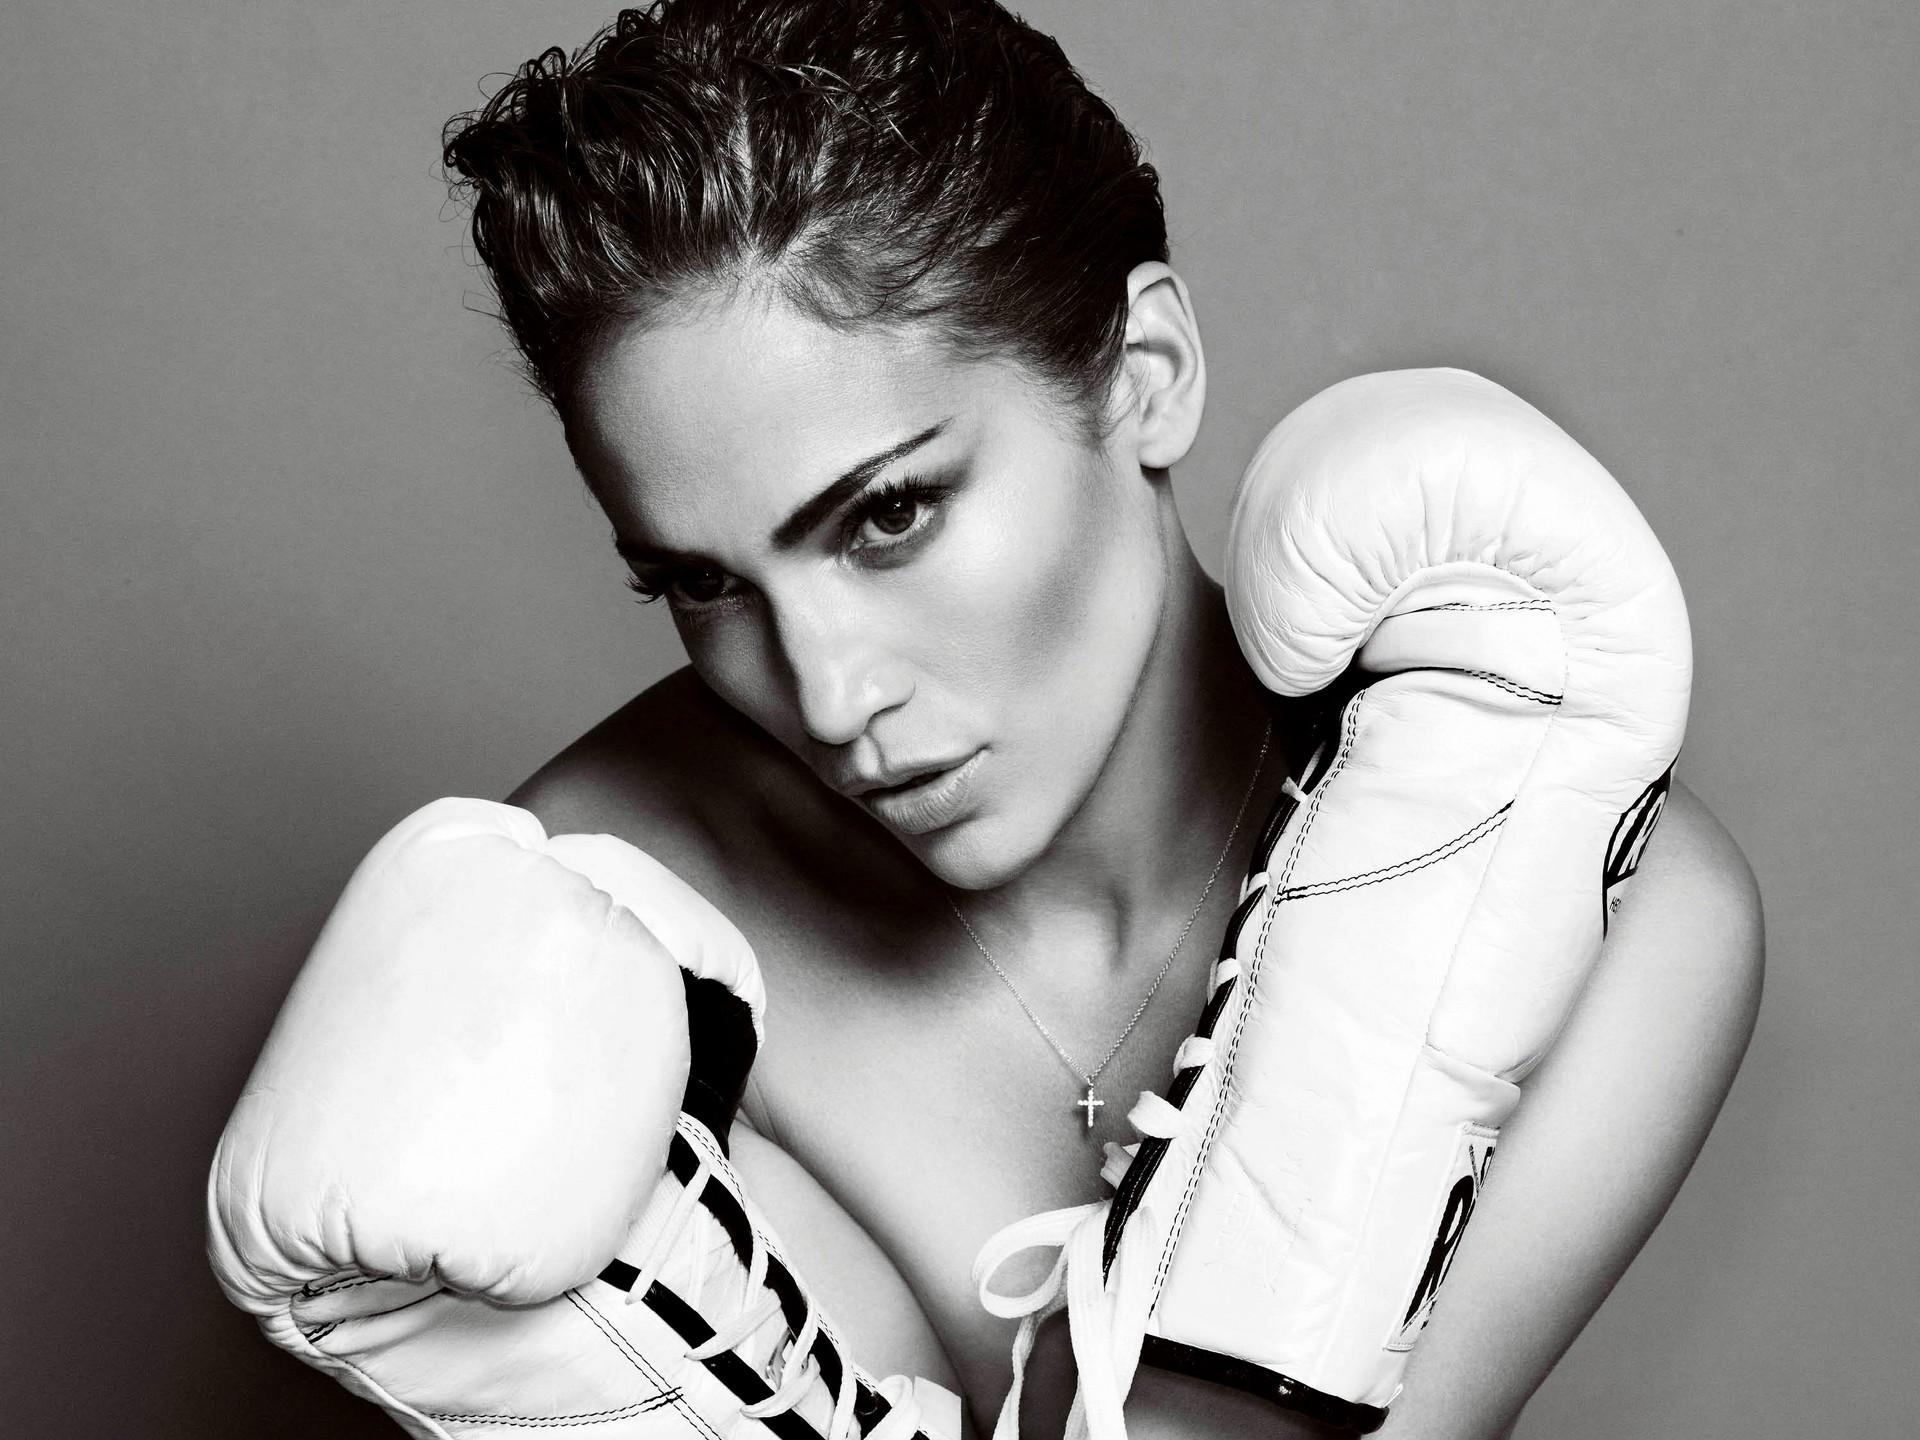 Res: 1920x1440, Girl in white boxing gloves